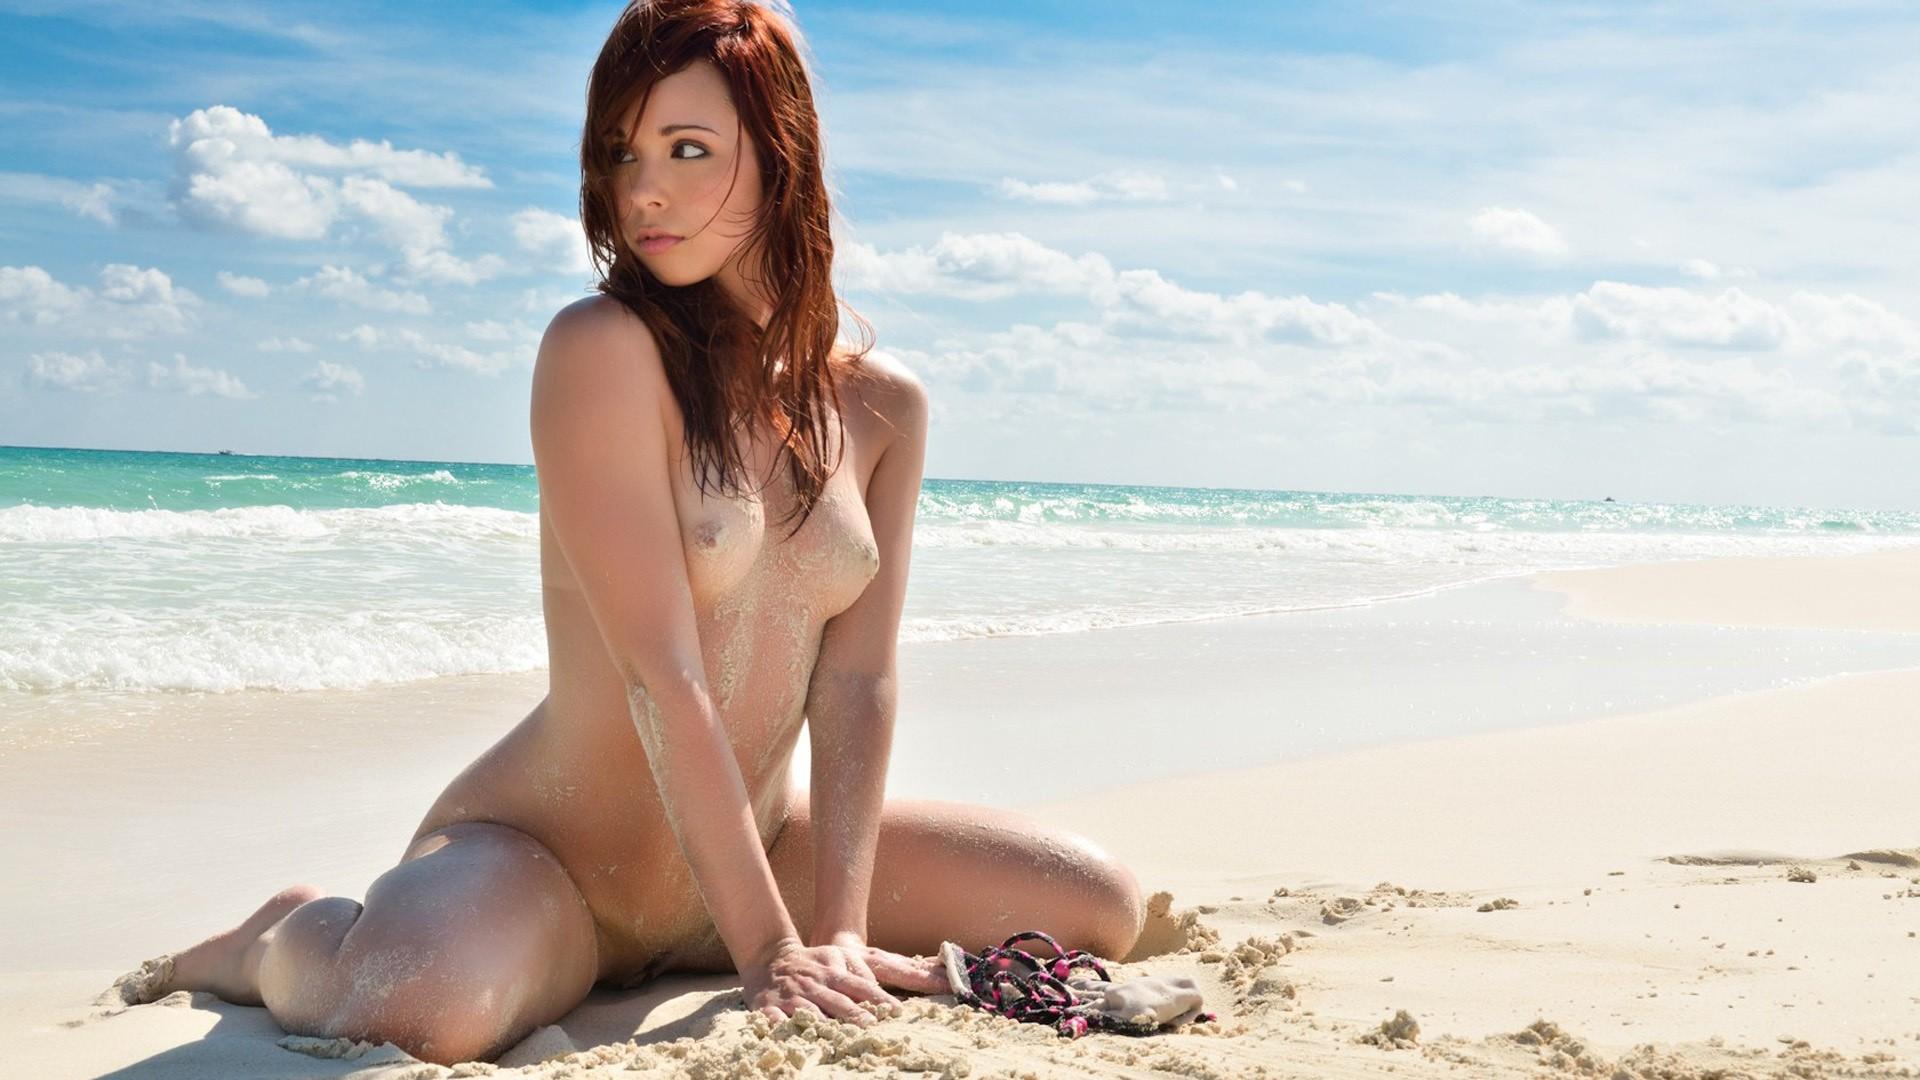 Sexy island girls topless